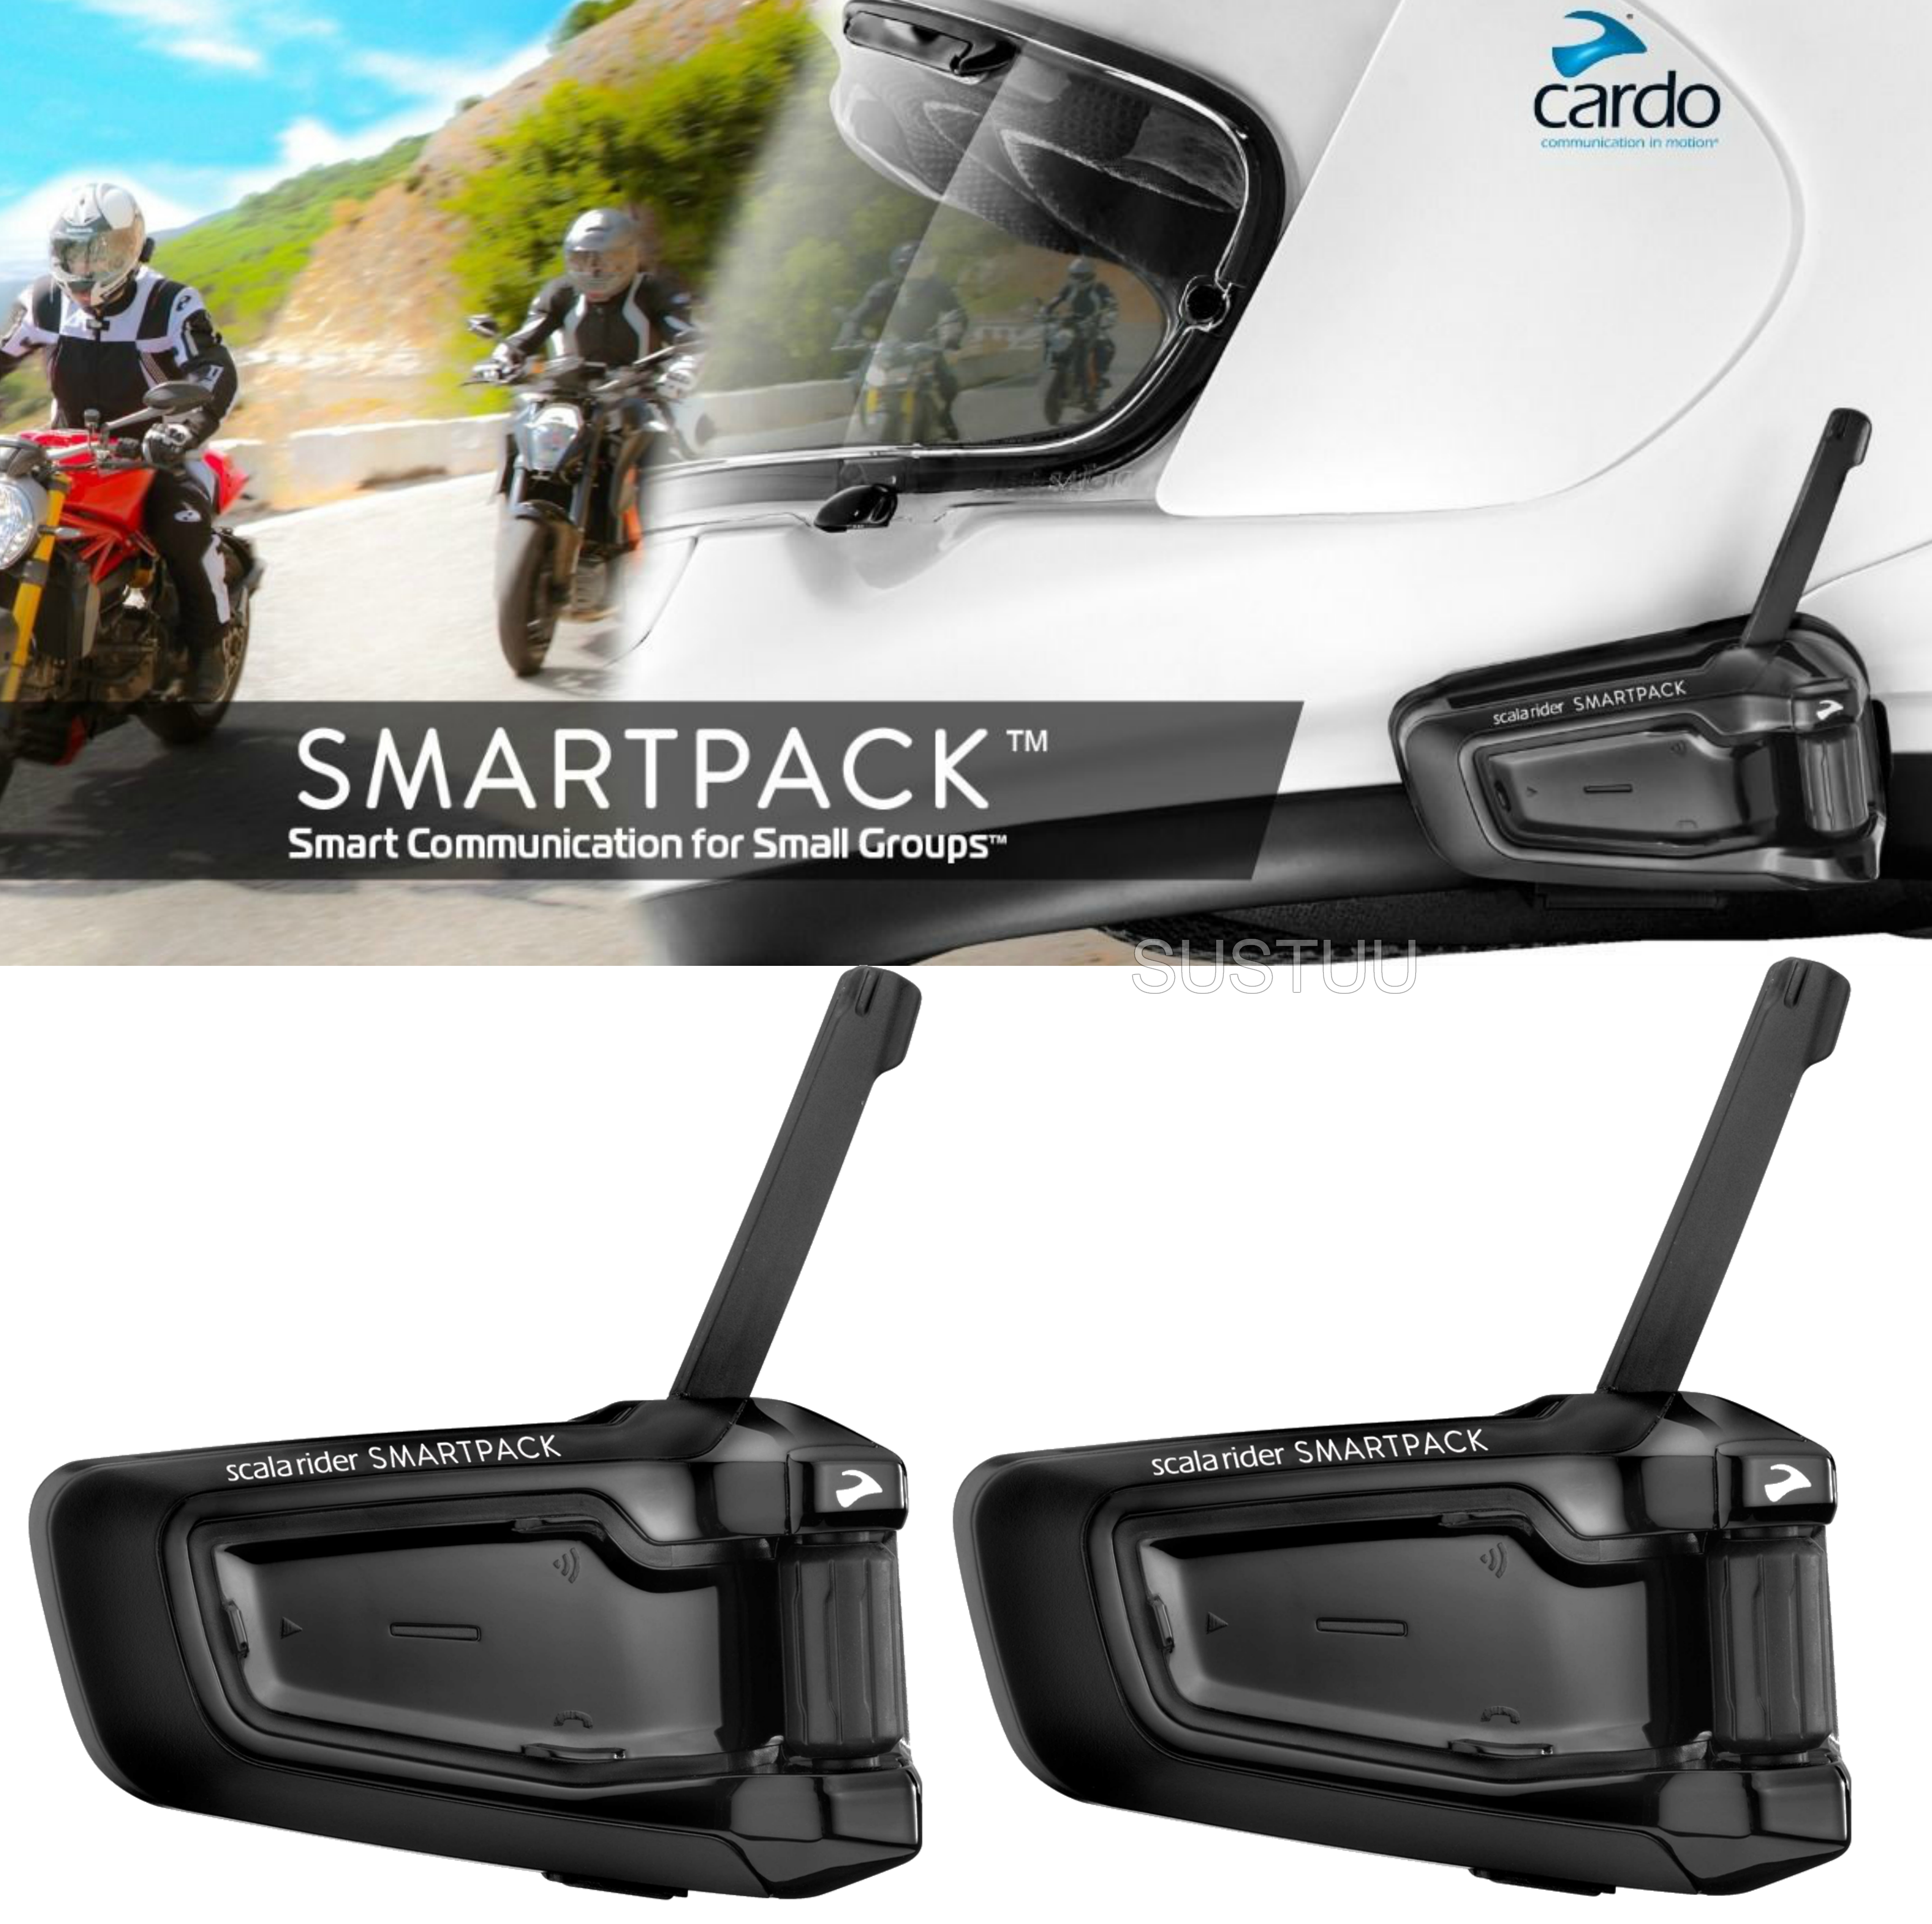 Cardo Scala Rider SmartPack Duo Bluetooth Headset | Motorcycle Helmet Intercom | Black